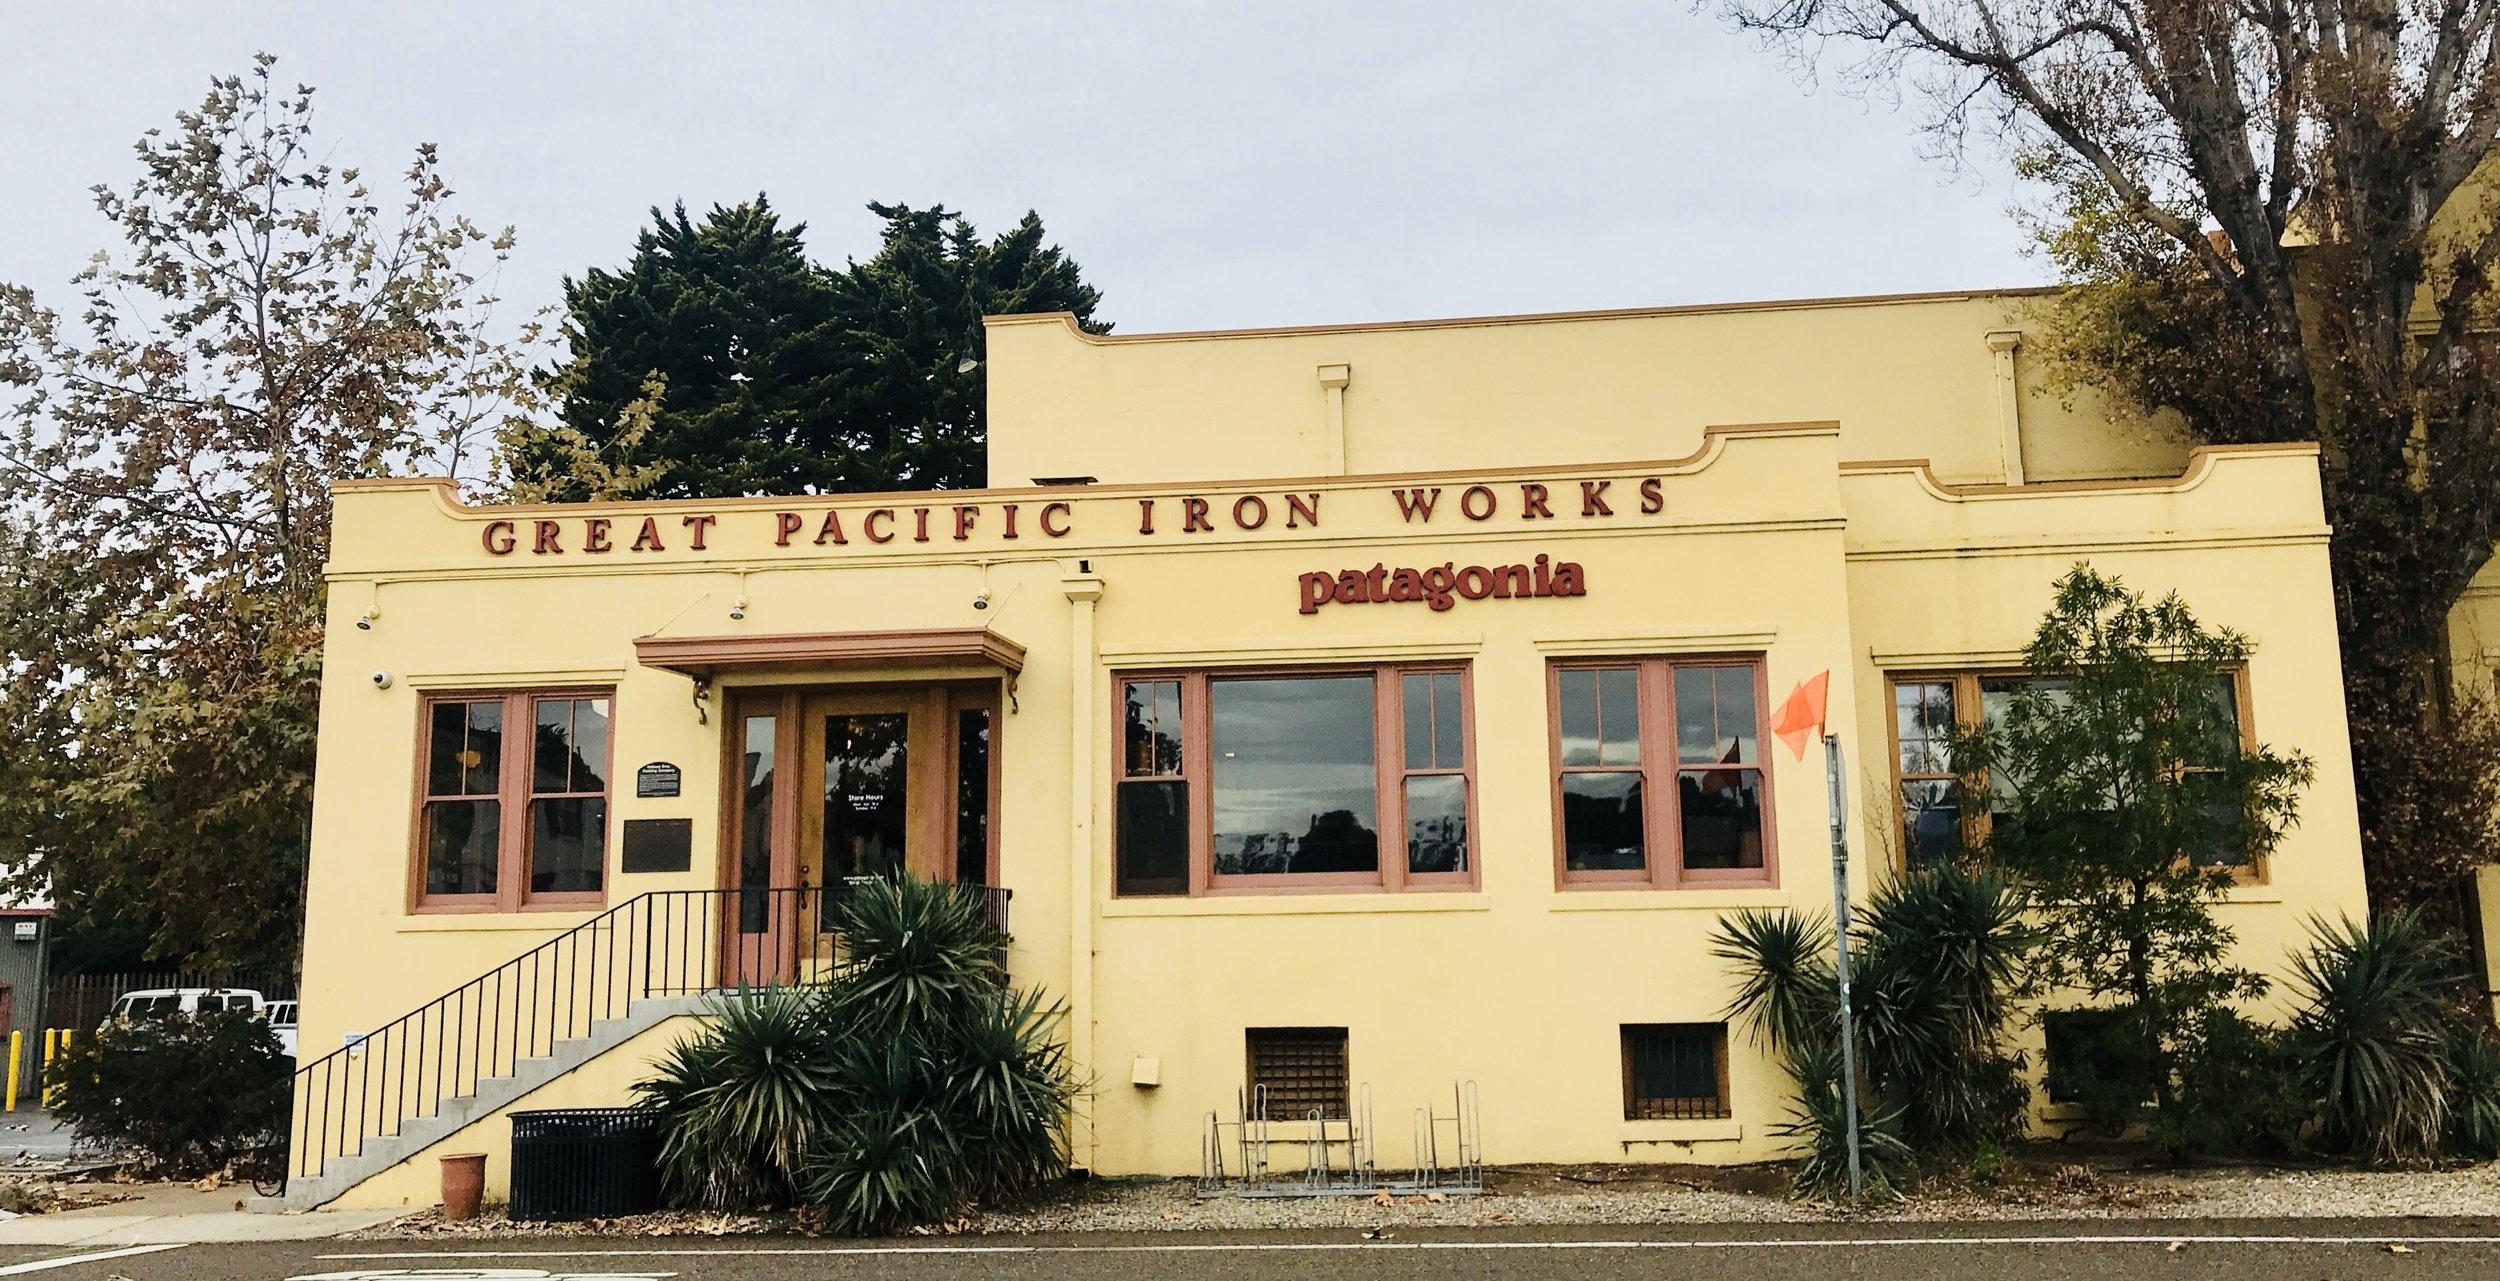 Welcome to Patagonia headquarters in Ventura, California.